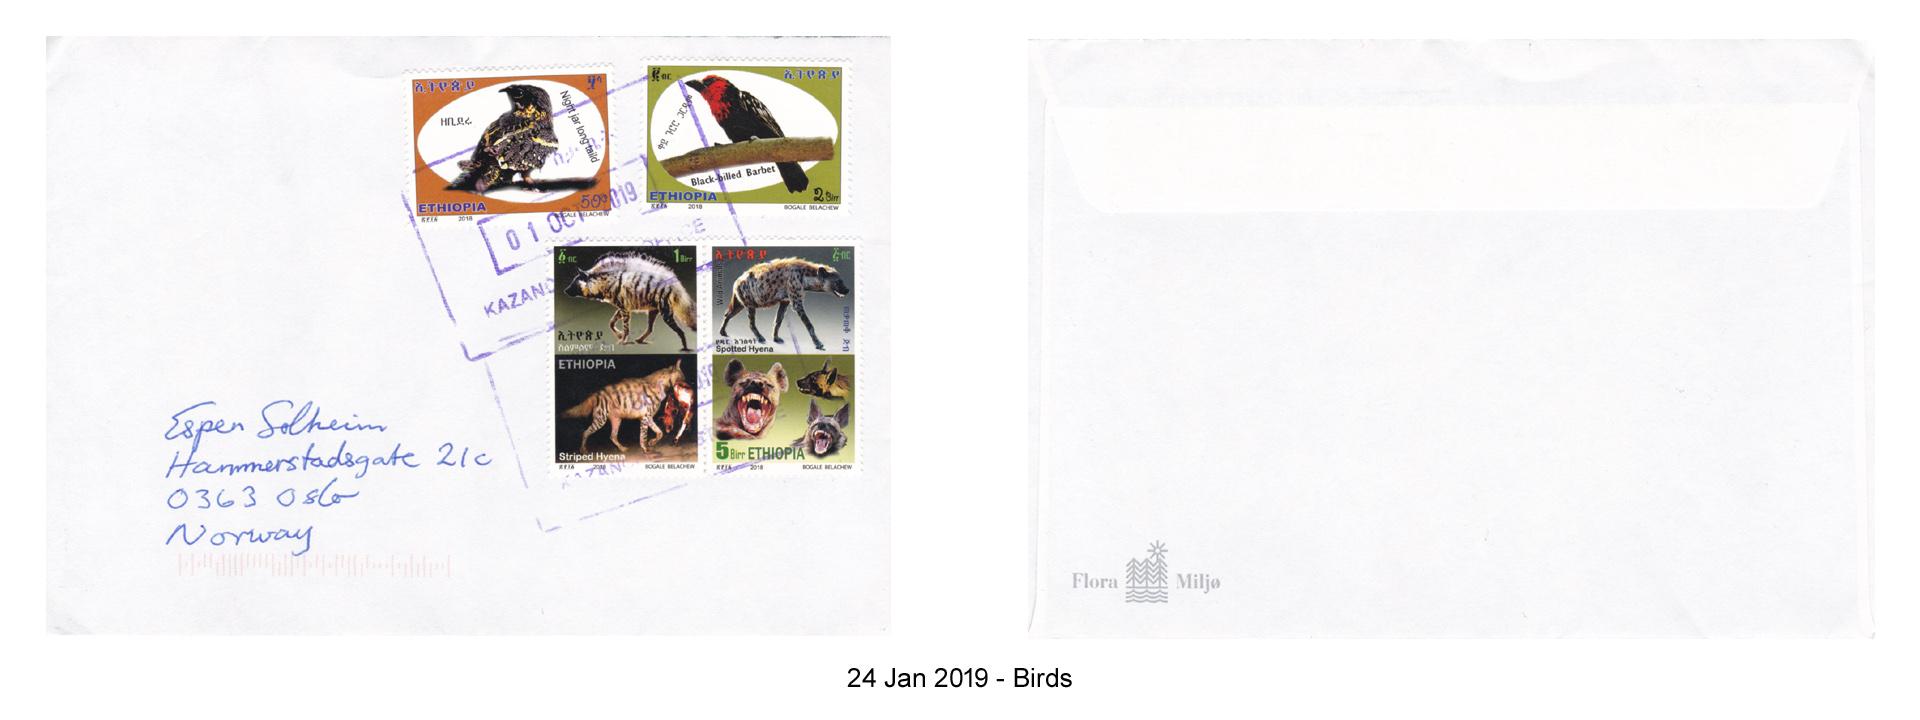 20190124 - Birds